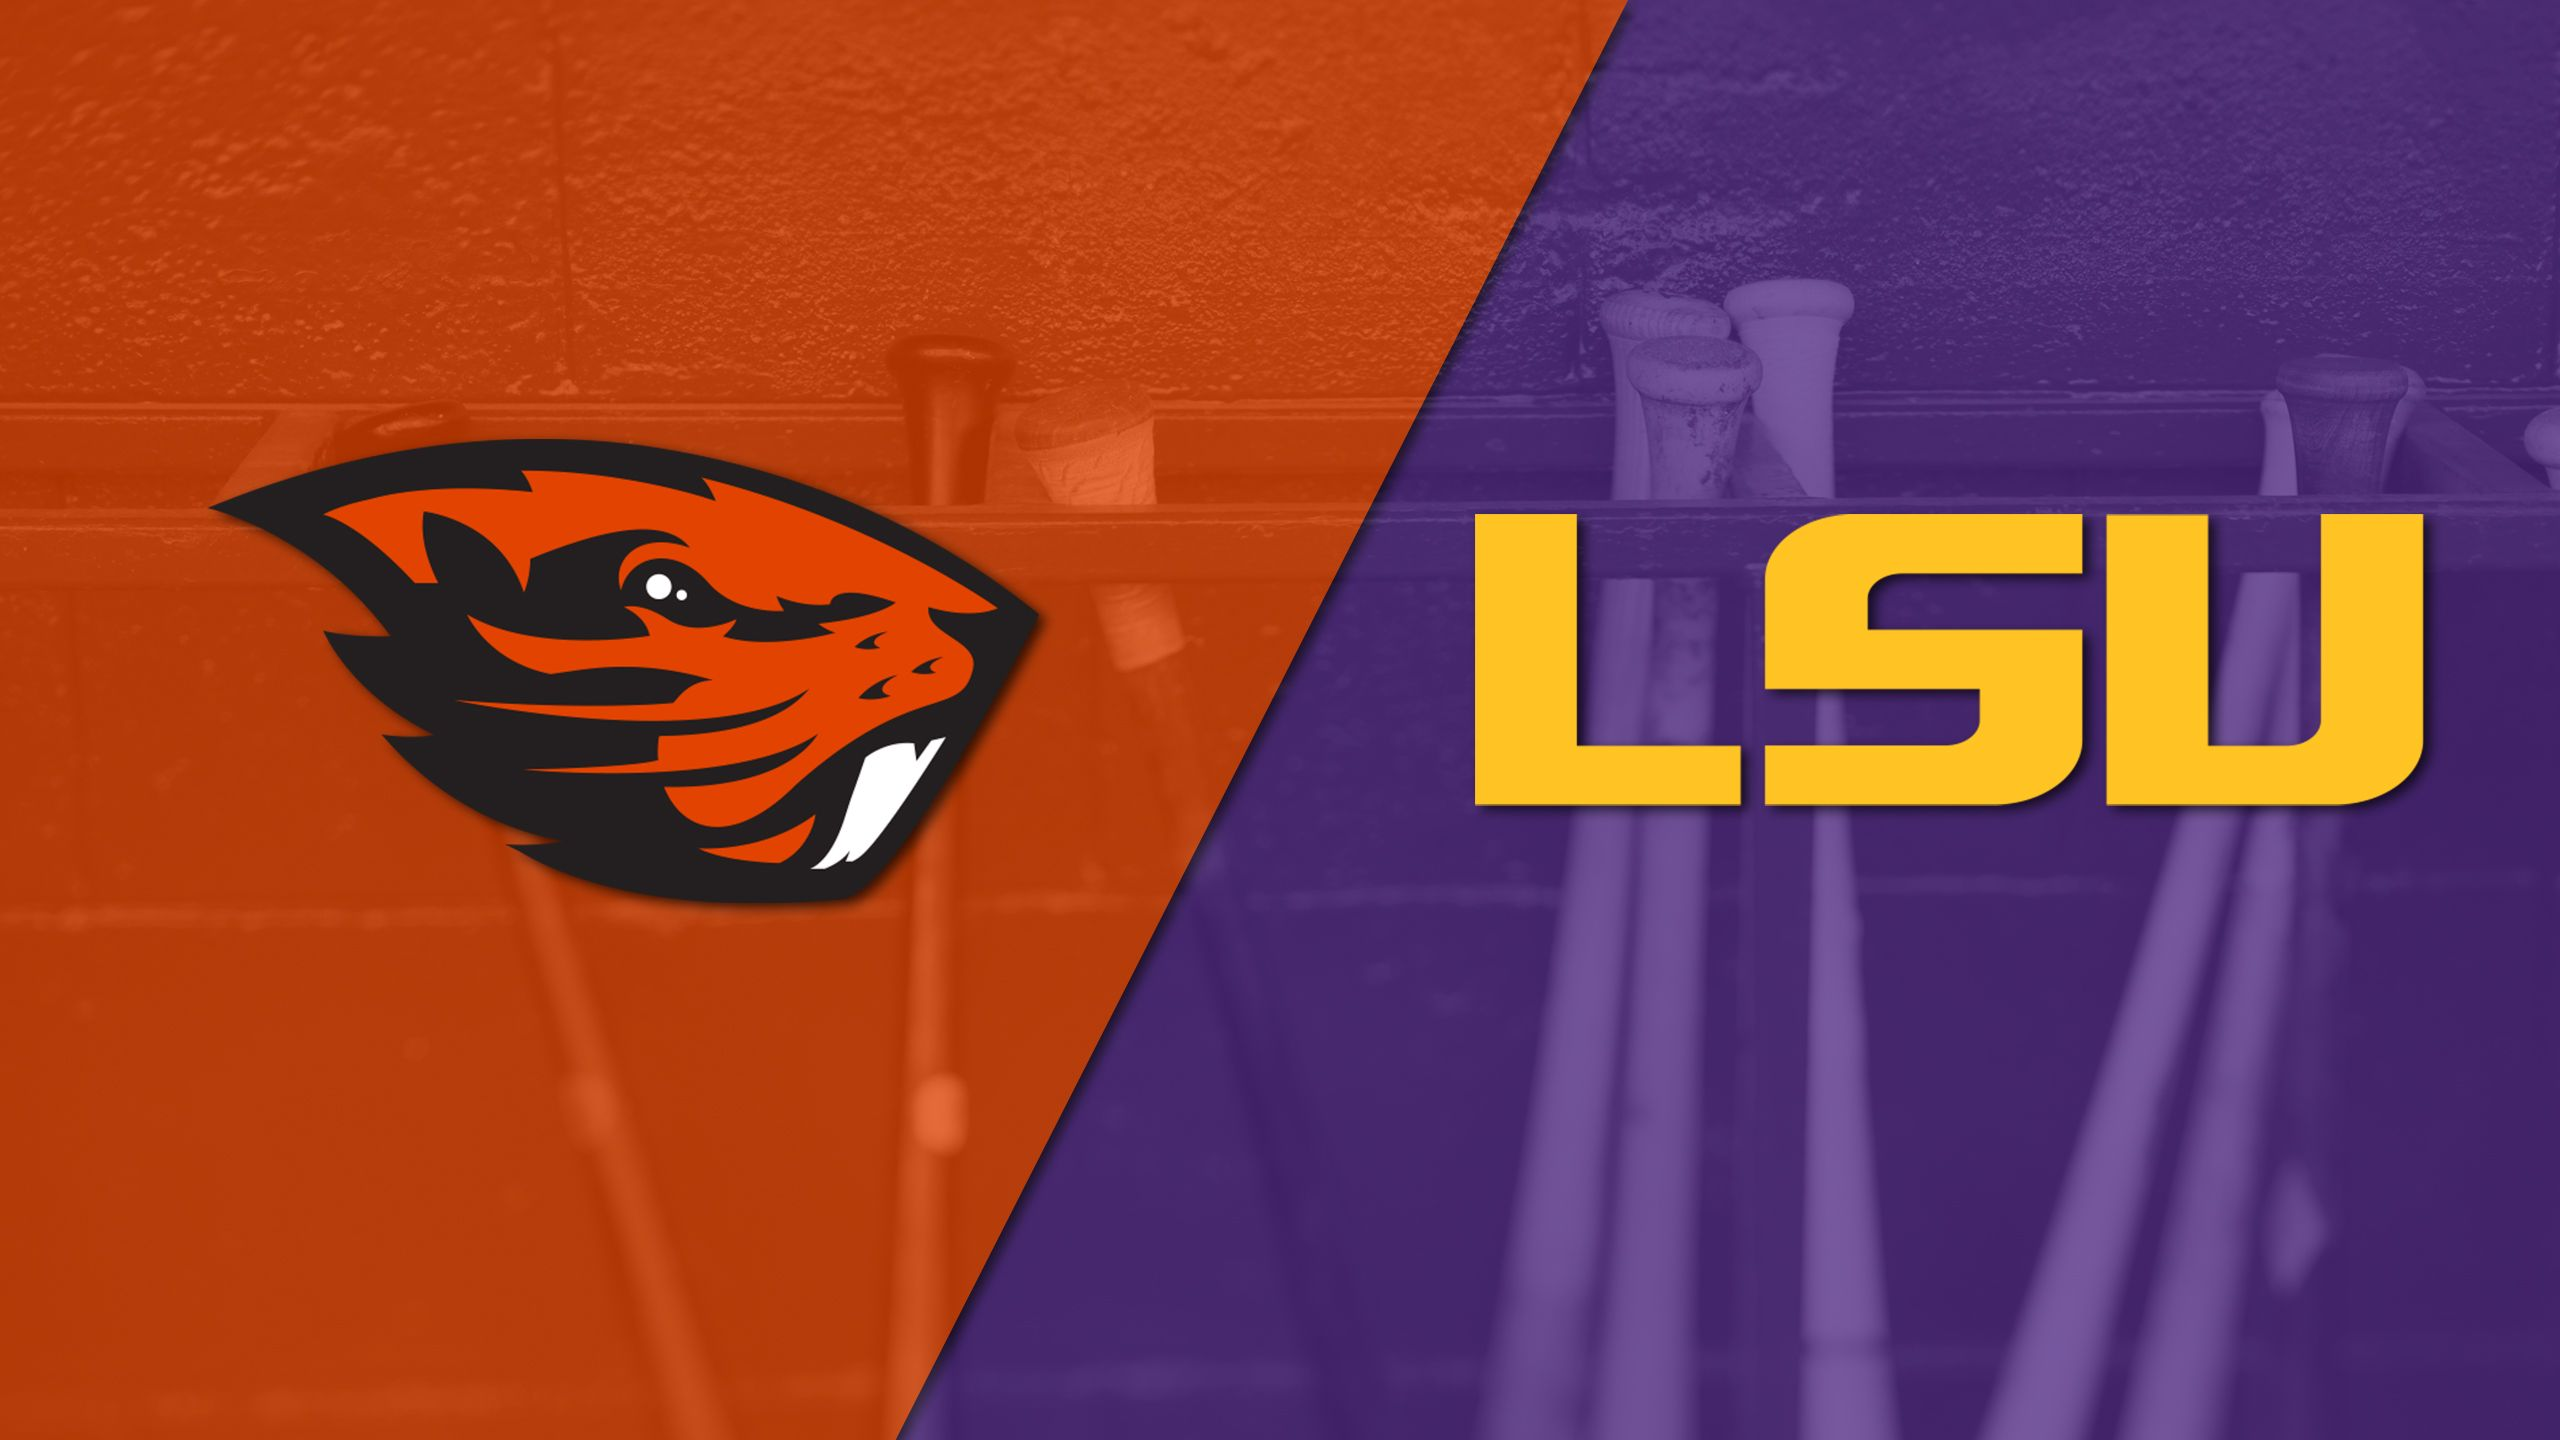 #1 Oregon State vs. #4 LSU (Game 6) (College World Series)